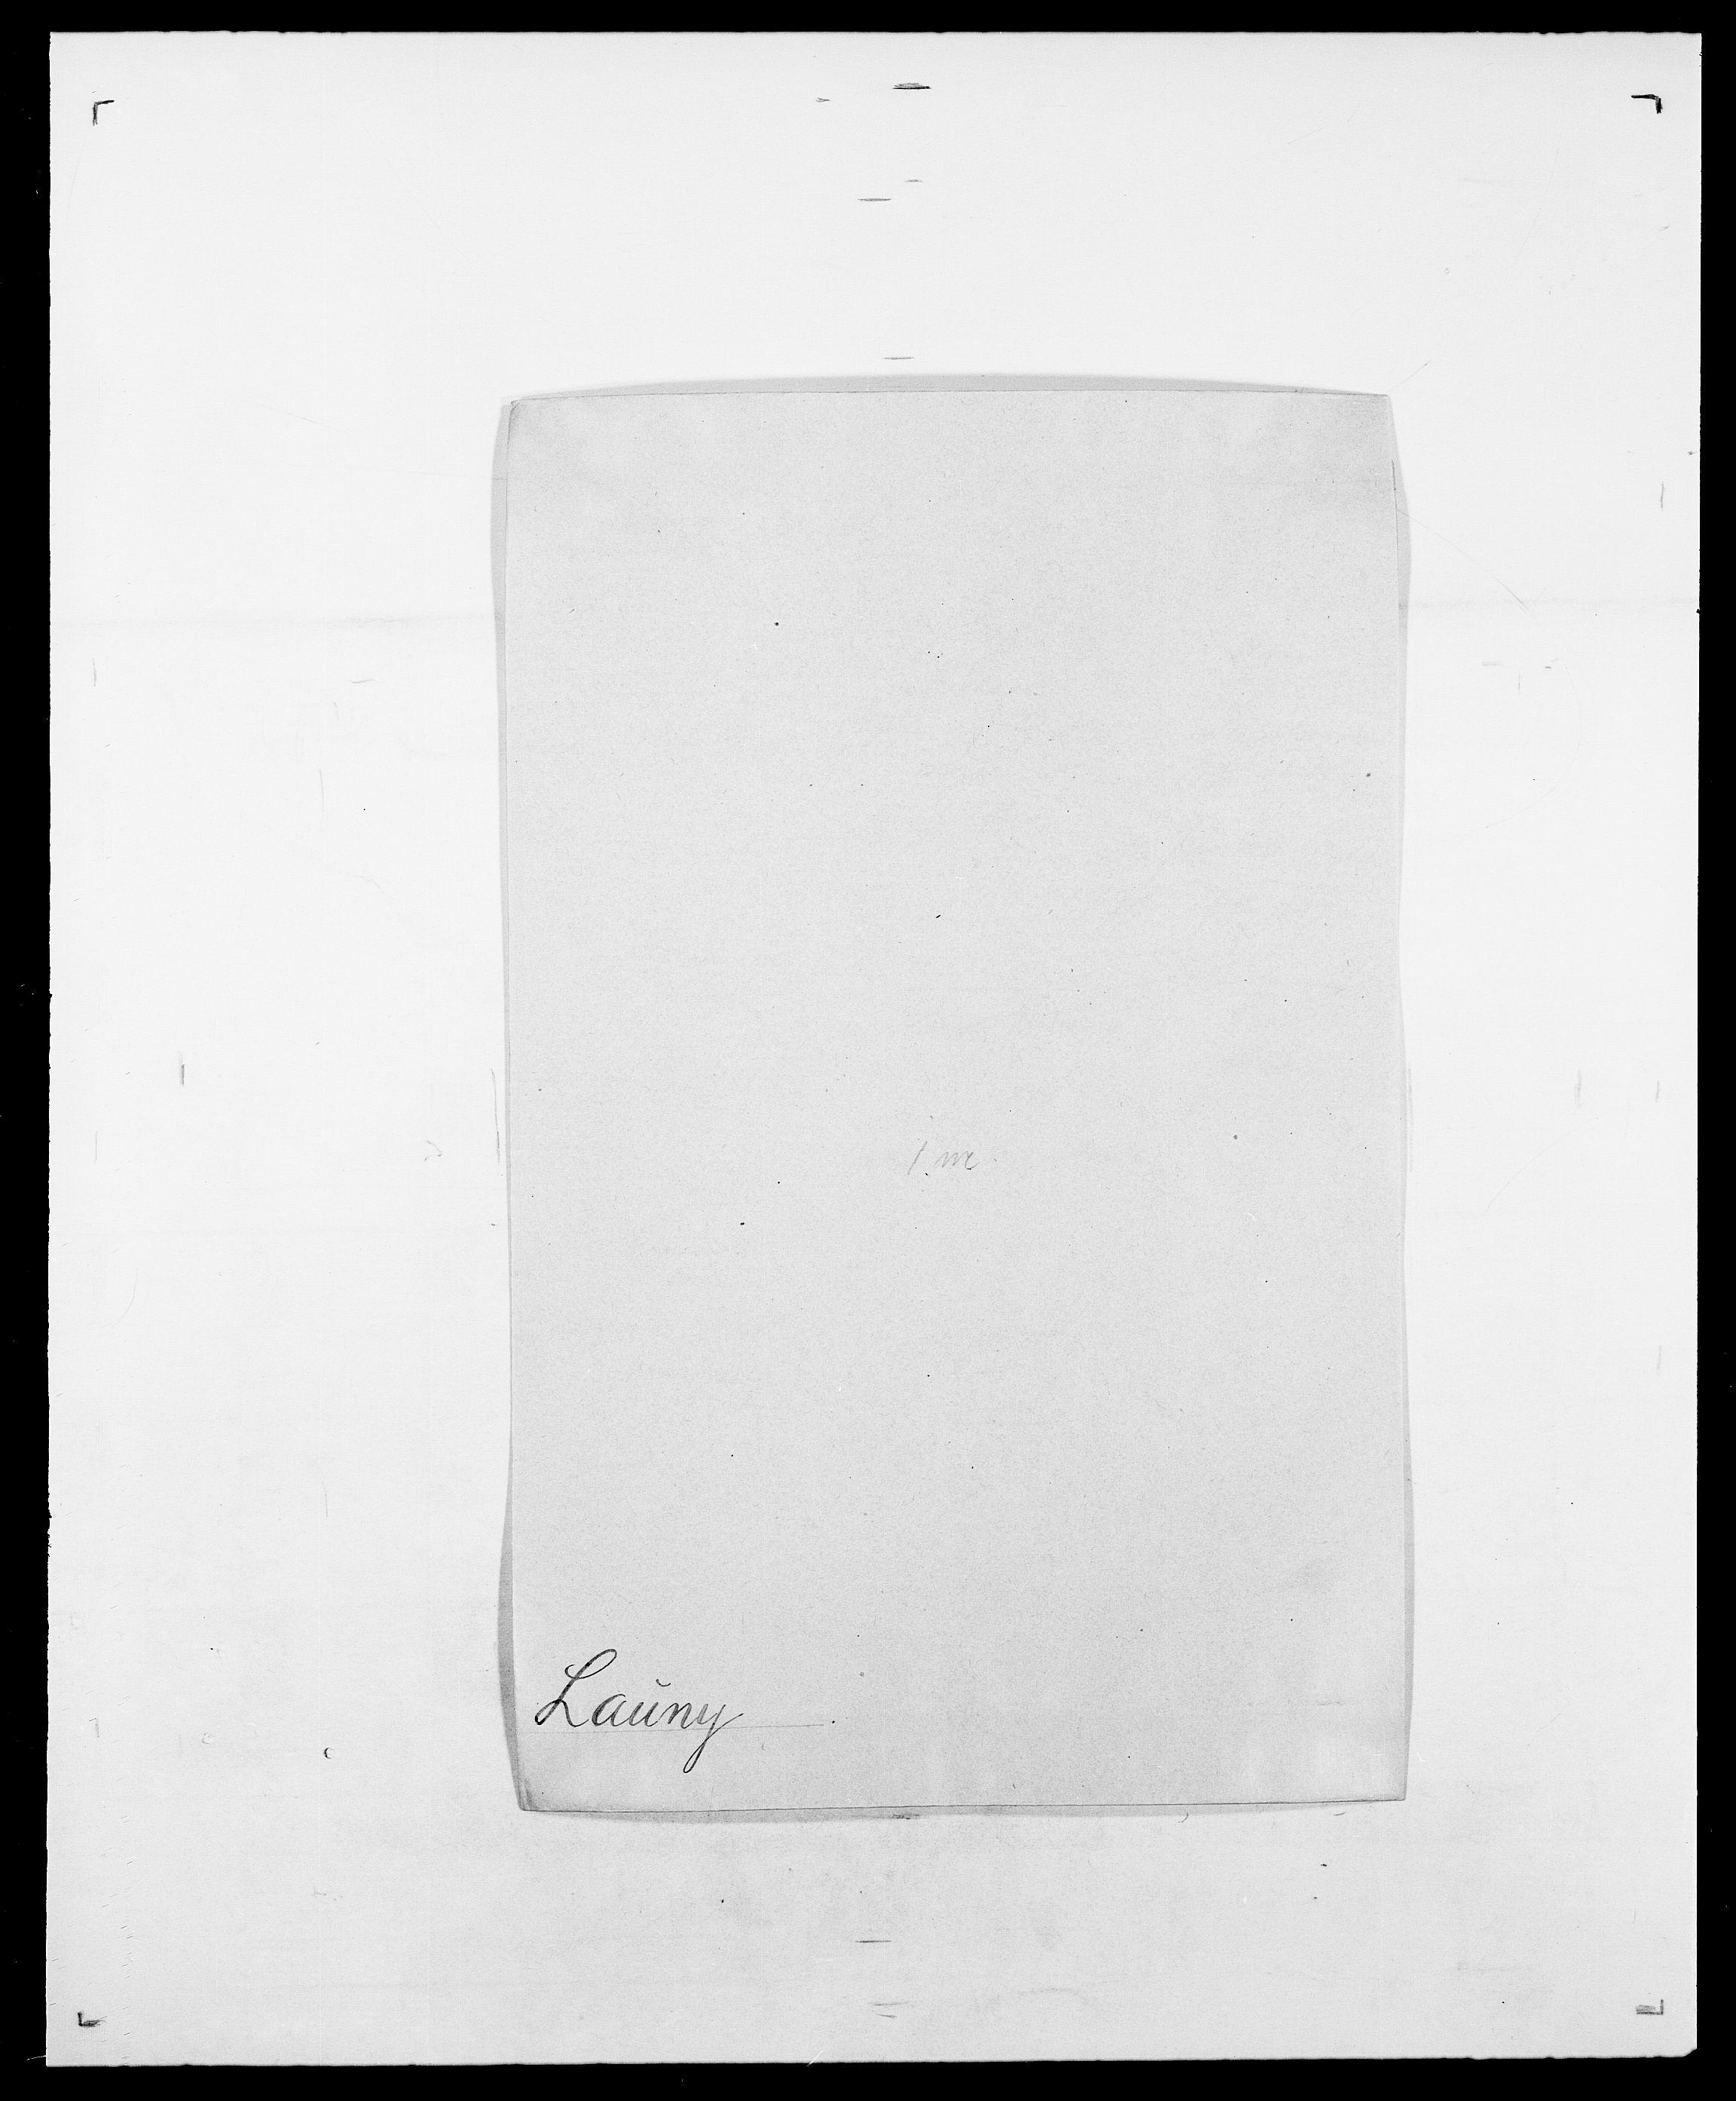 SAO, Delgobe, Charles Antoine - samling, D/Da/L0023: Lau - Lirvyn, s. 15